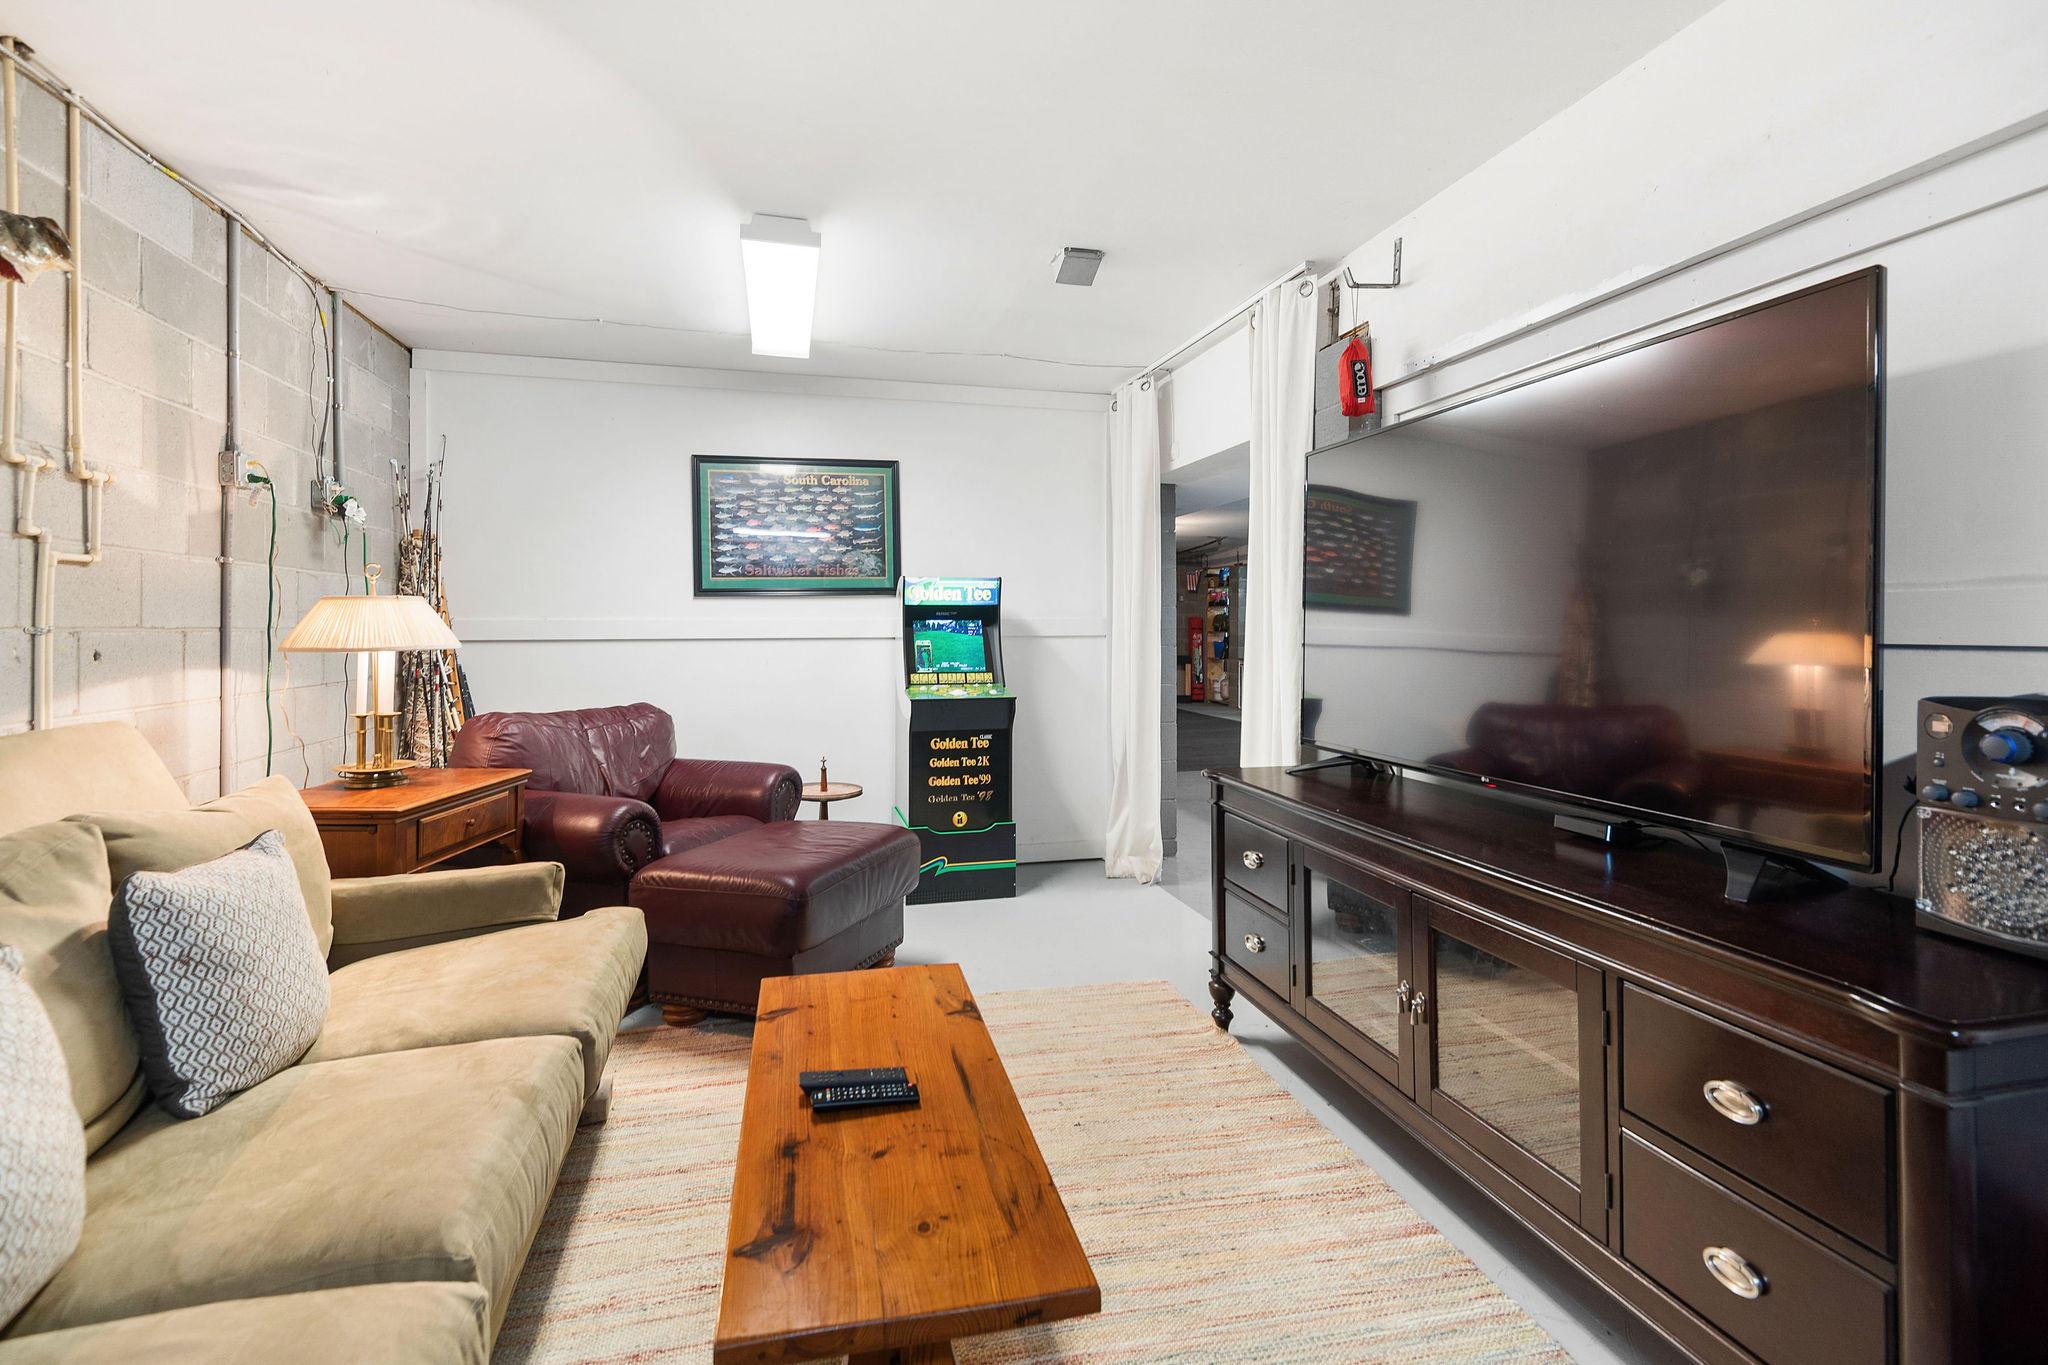 Country Club II Homes For Sale - 1482 Burningtree, Charleston, SC - 15